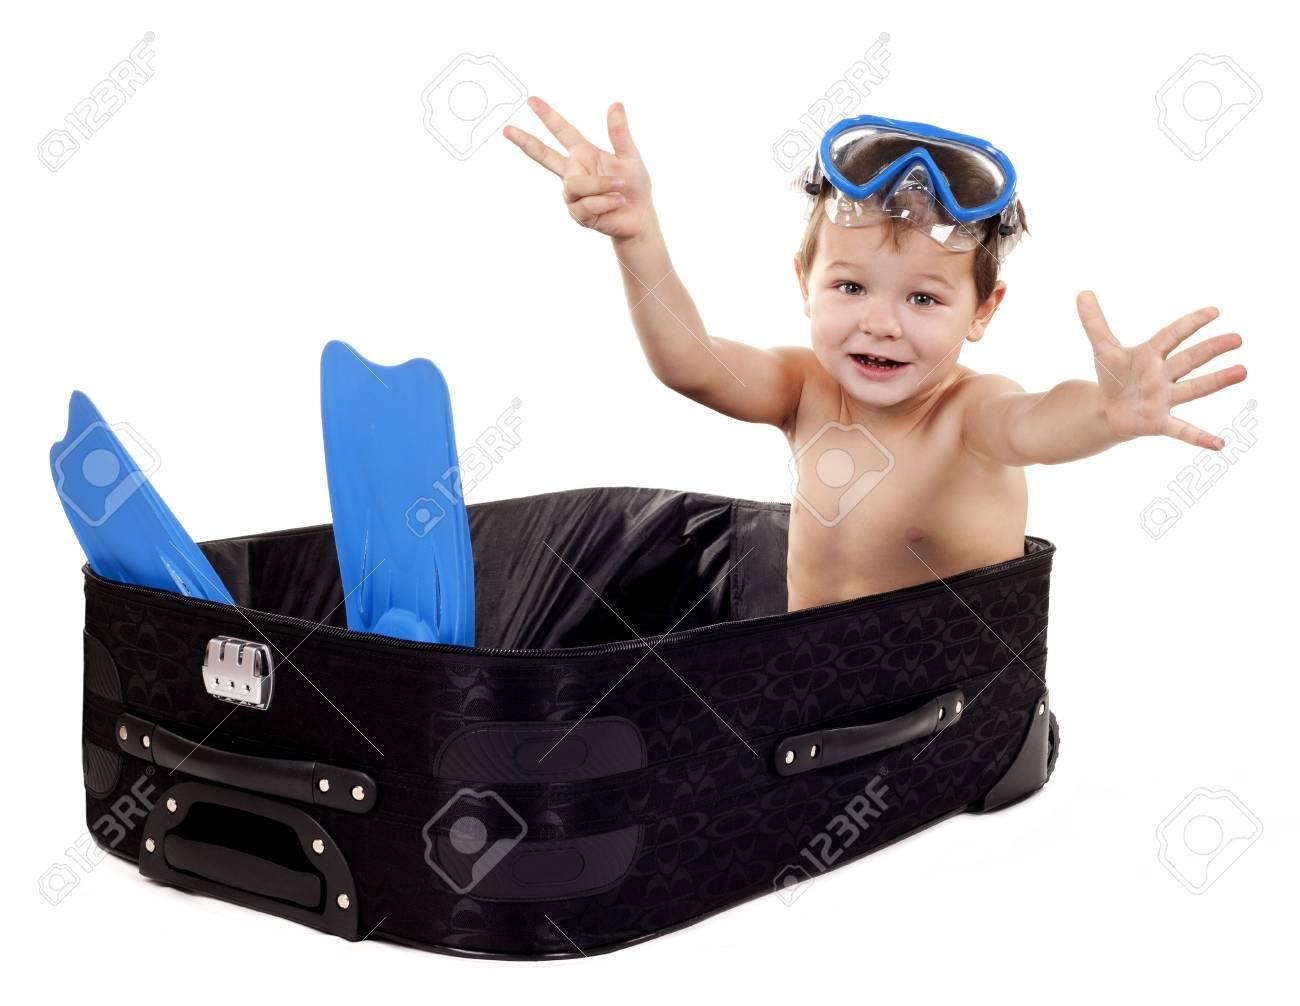 little boy sitting in the luggage wearing snorkel gear Stock Photo - 16878815